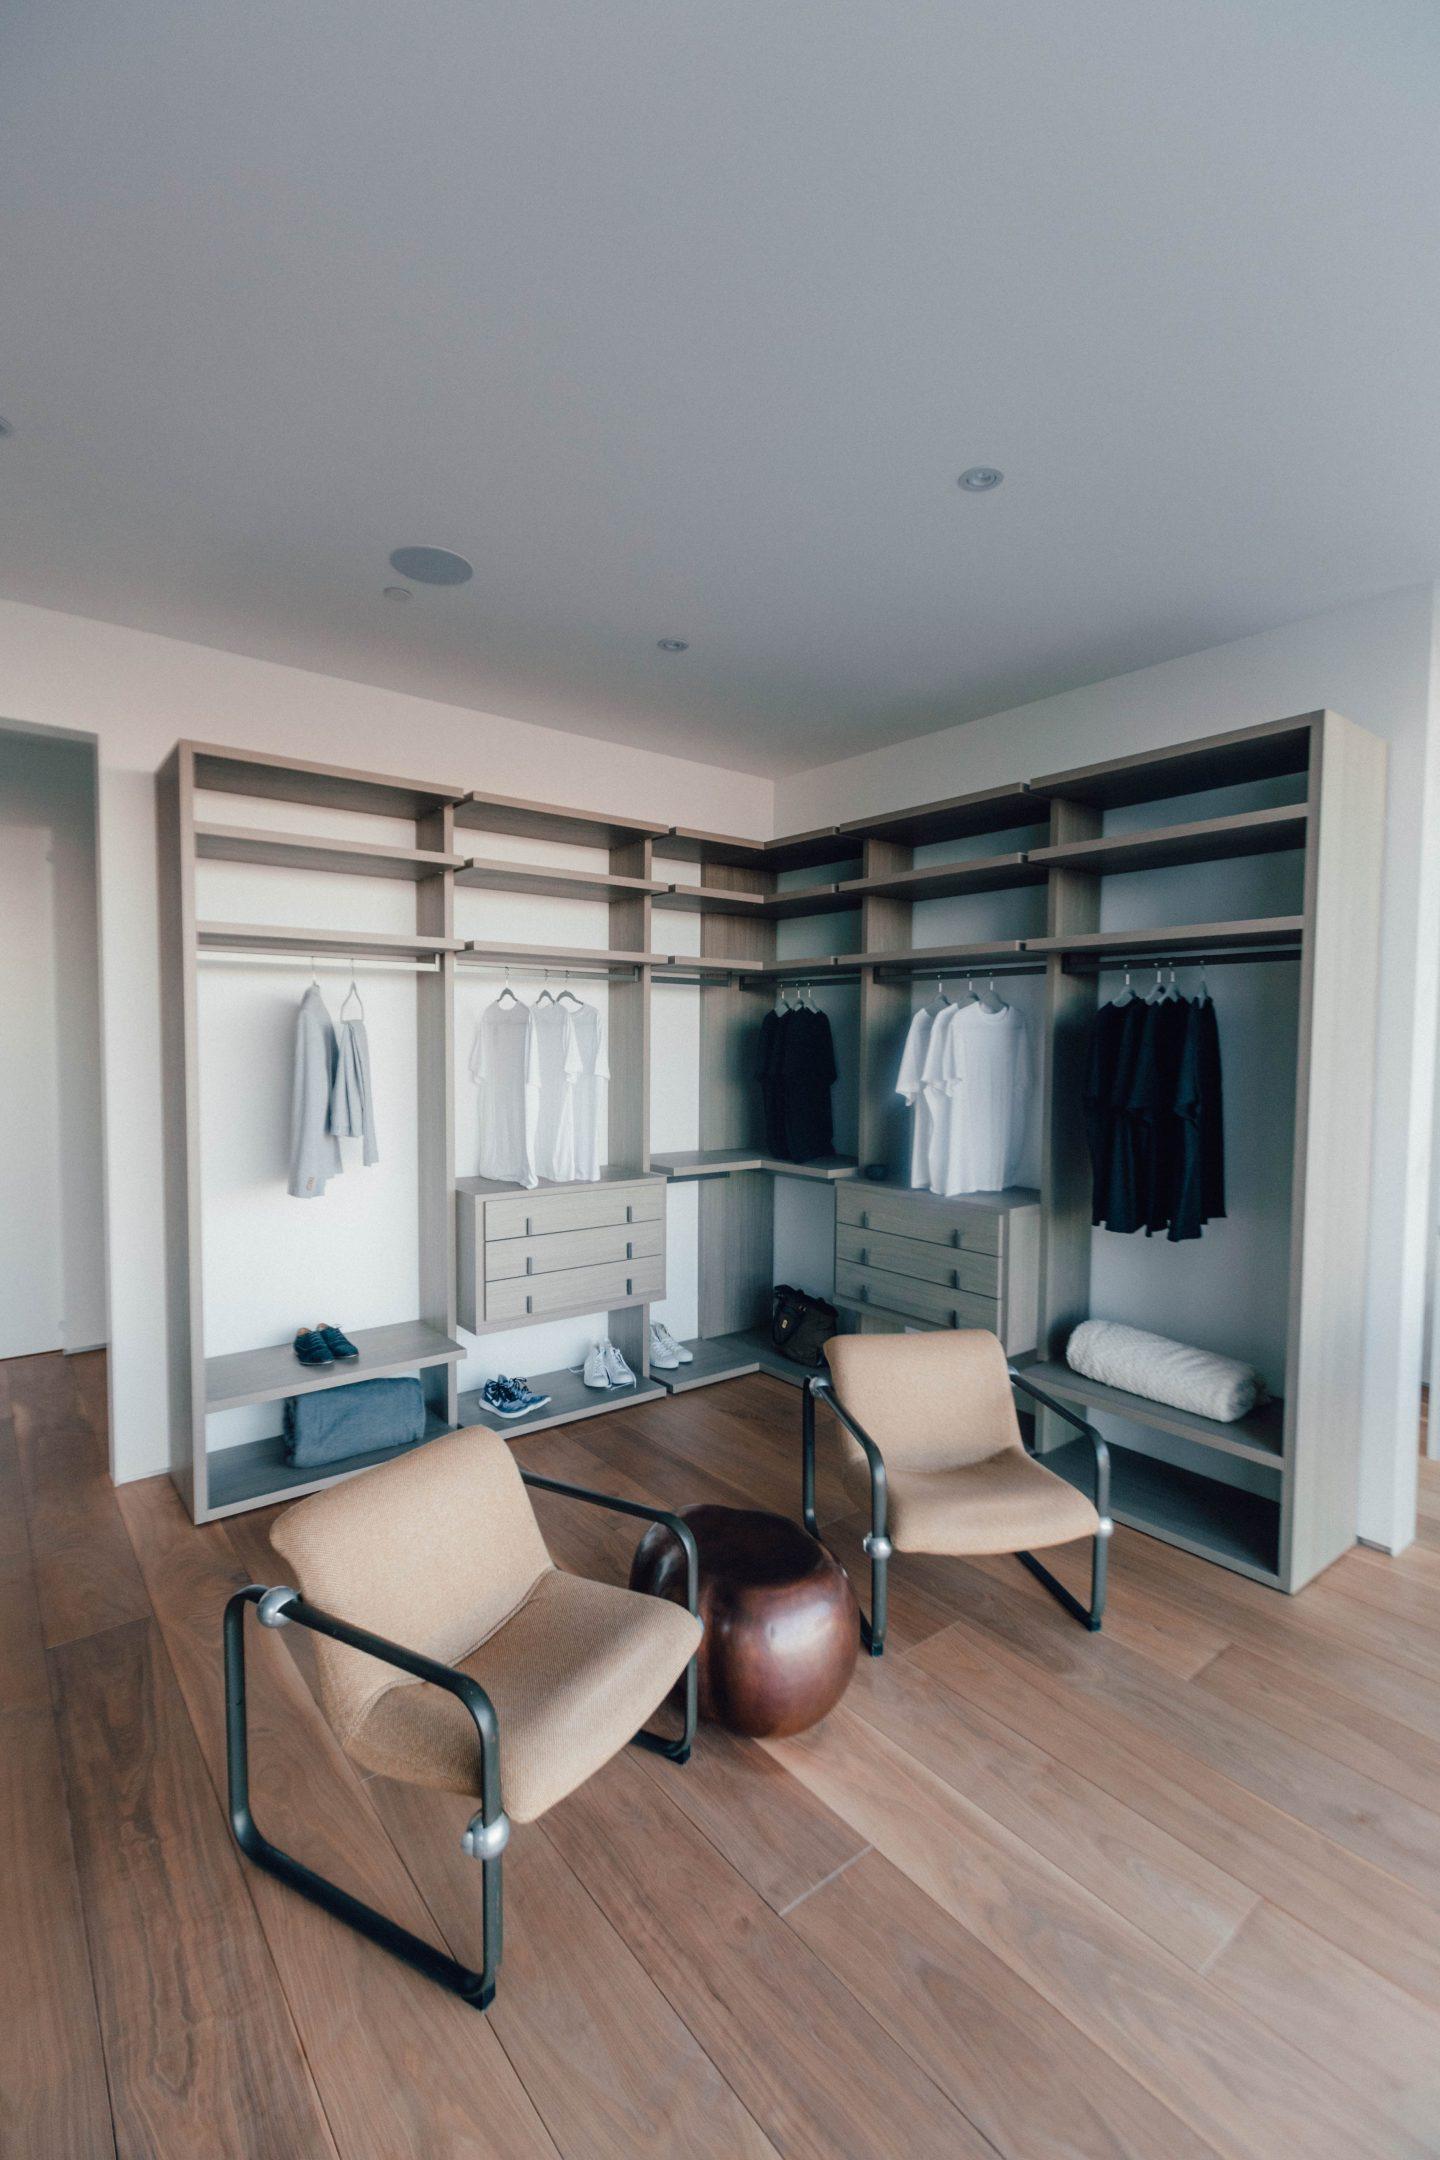 My dream home improvements